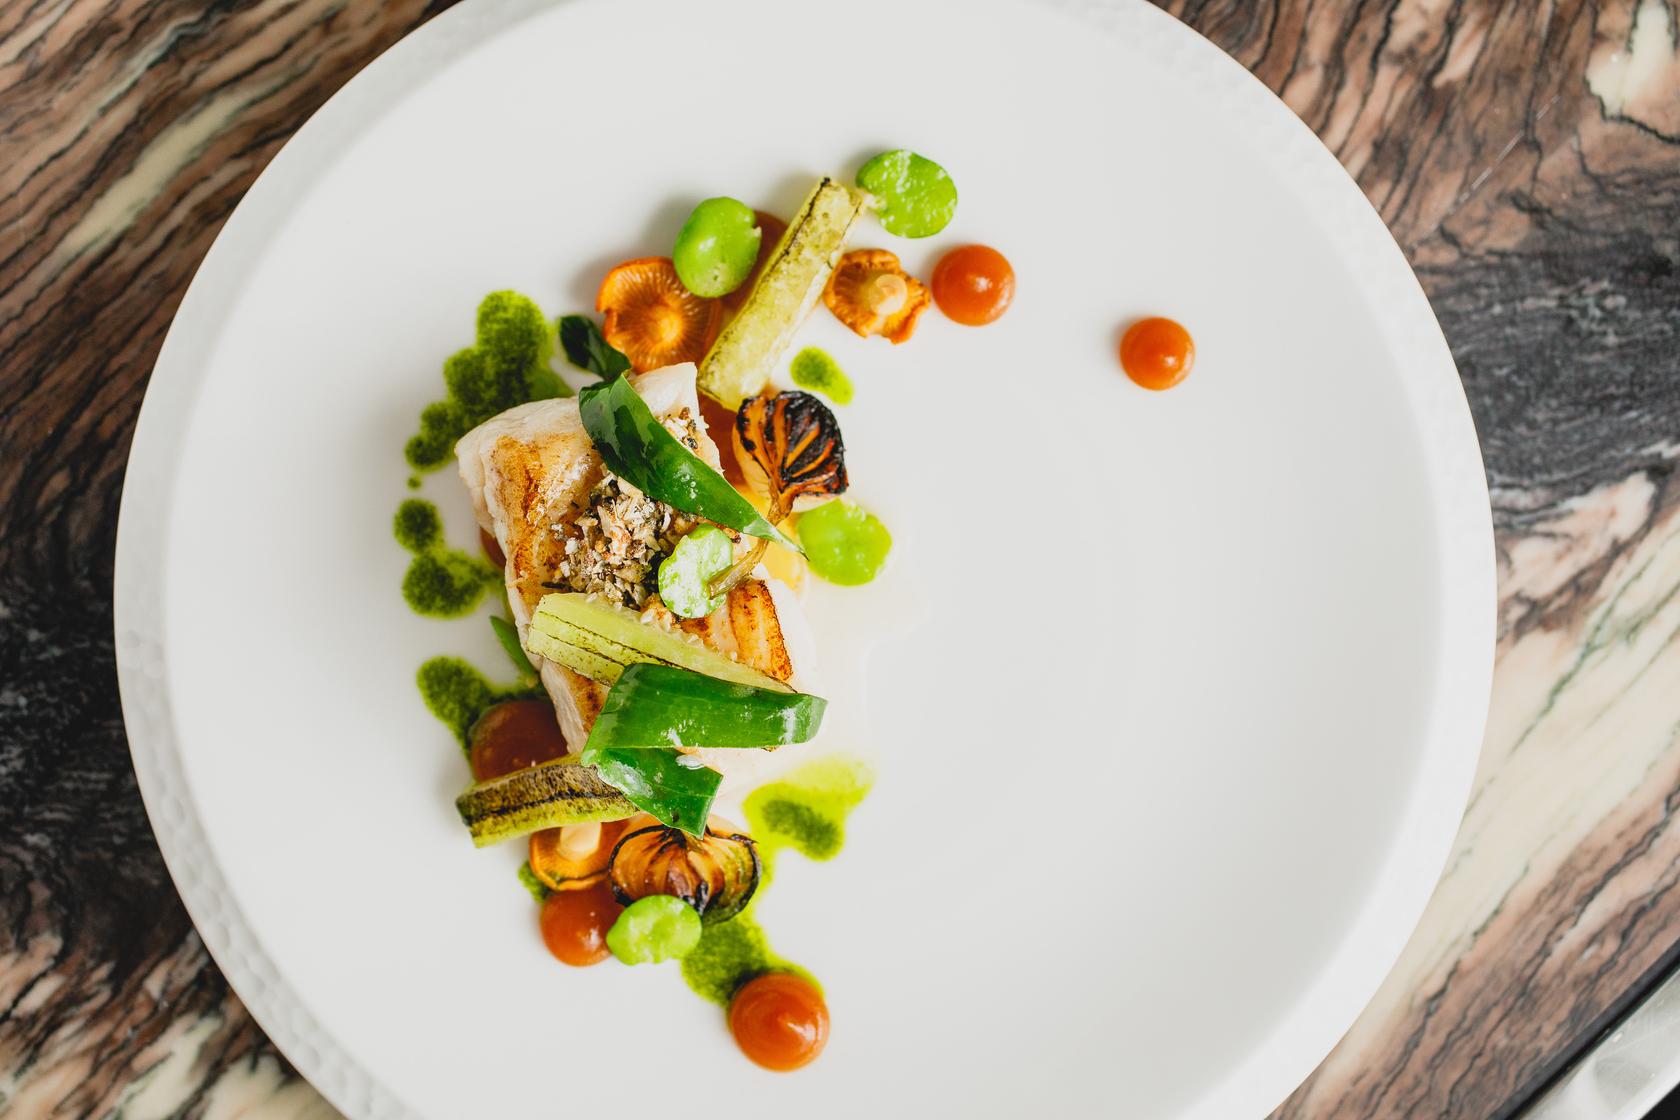 Roast wild halibut, broad beans, sea beet and lovage by Tom Shepherd, head chef at Adam's Restaurant, Birmingham